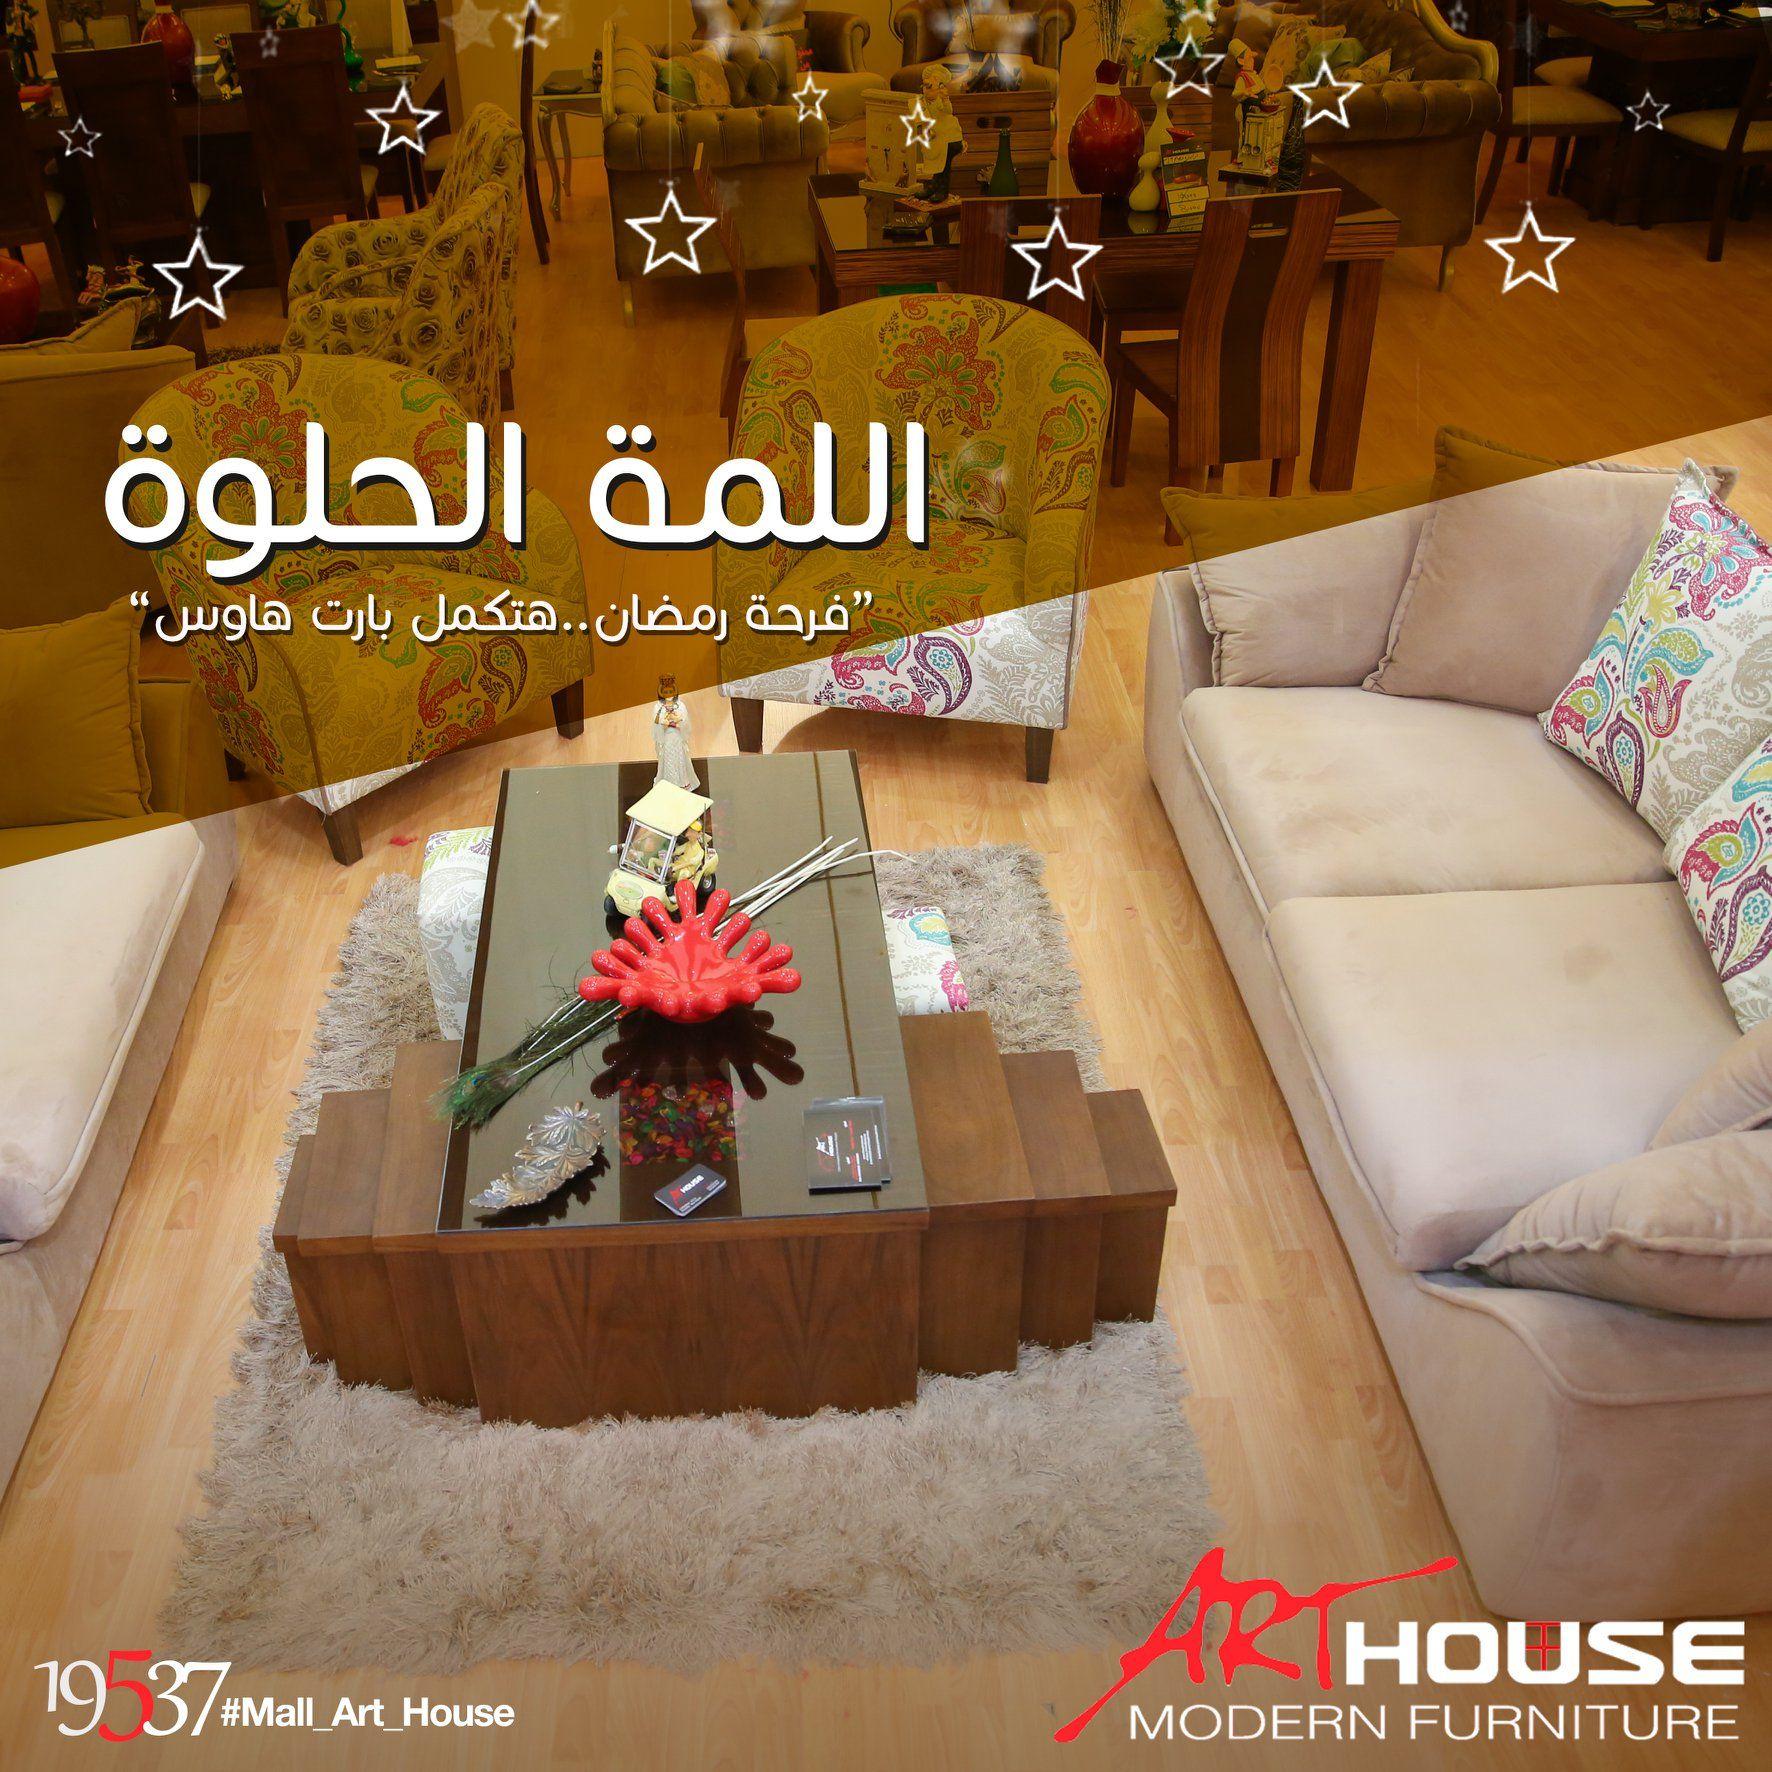 Pin By Casadar On Casadar Home Art Modern Furniture Decor